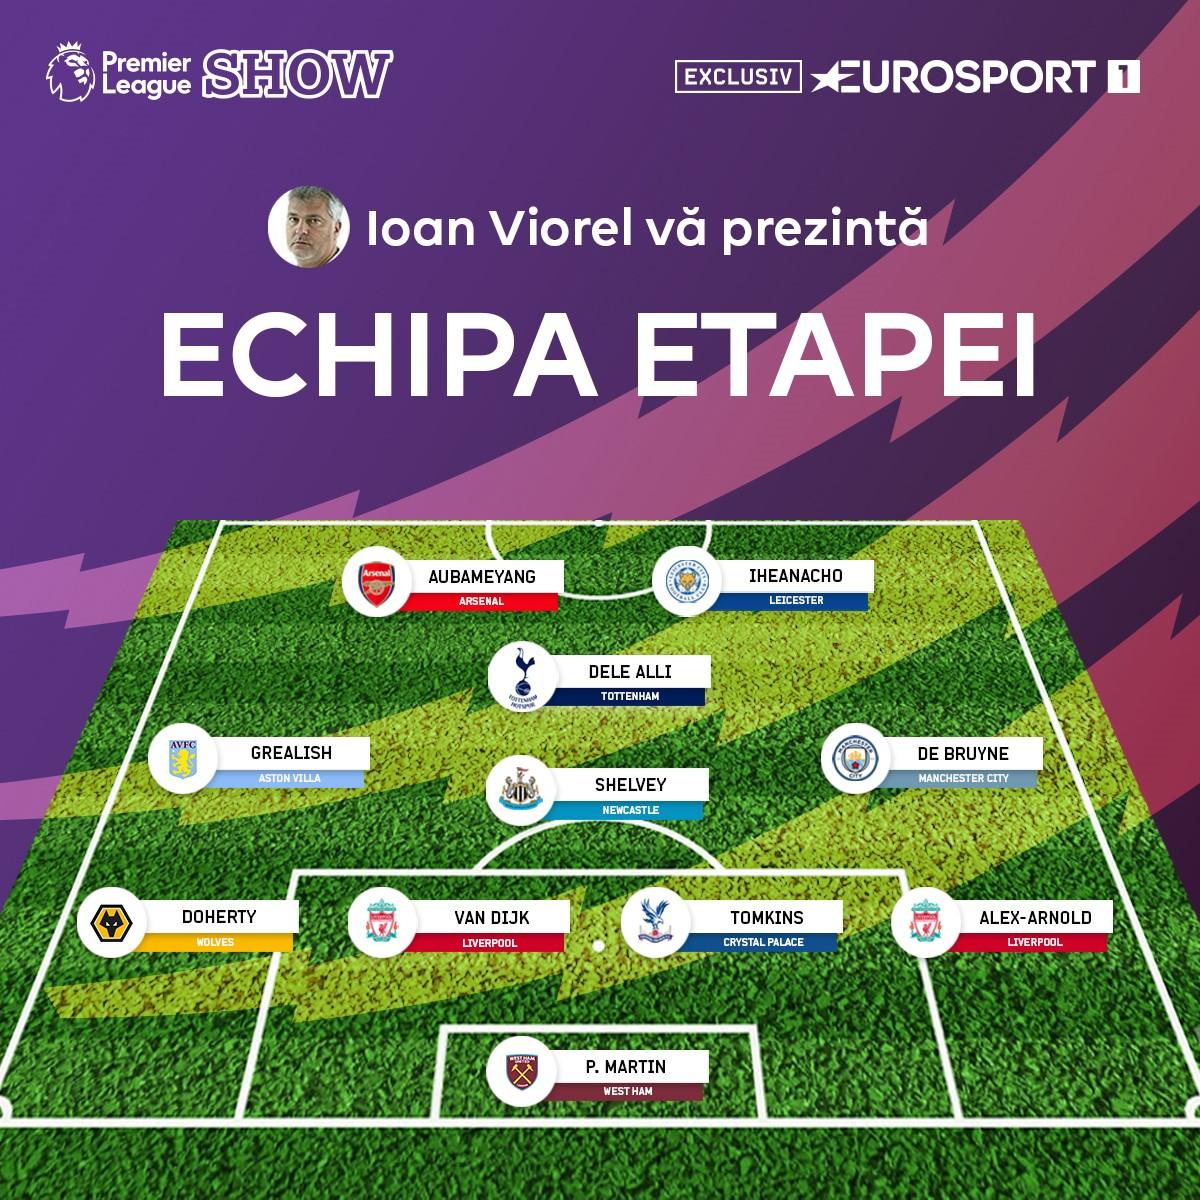 https://i.eurosport.com/2019/12/04/2730010.jpg